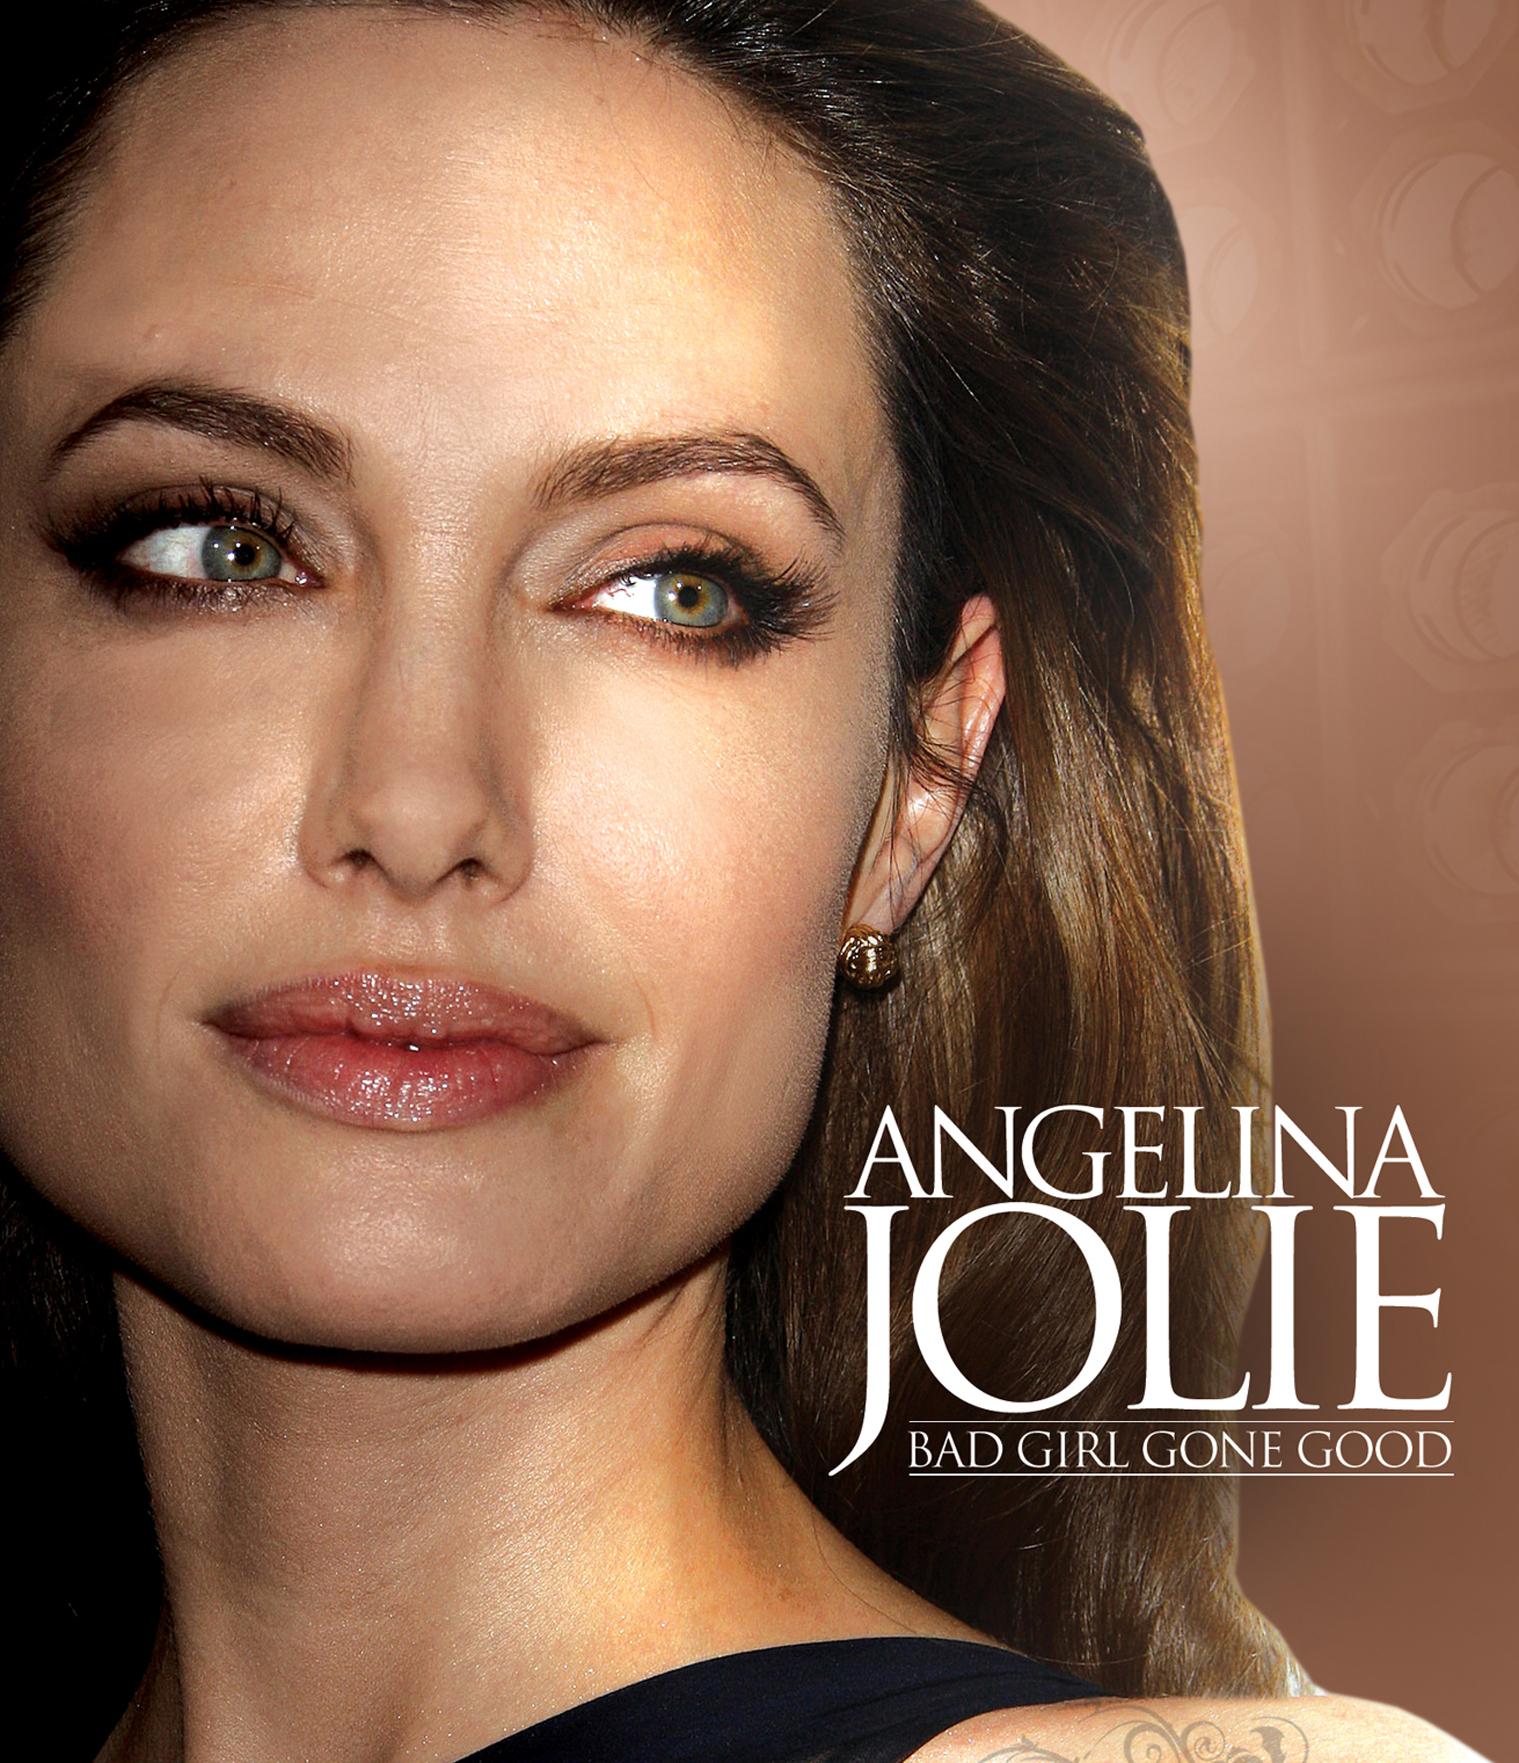 Angelina Jolie: Bad Girl Gone Good - Unauthorized Documentary